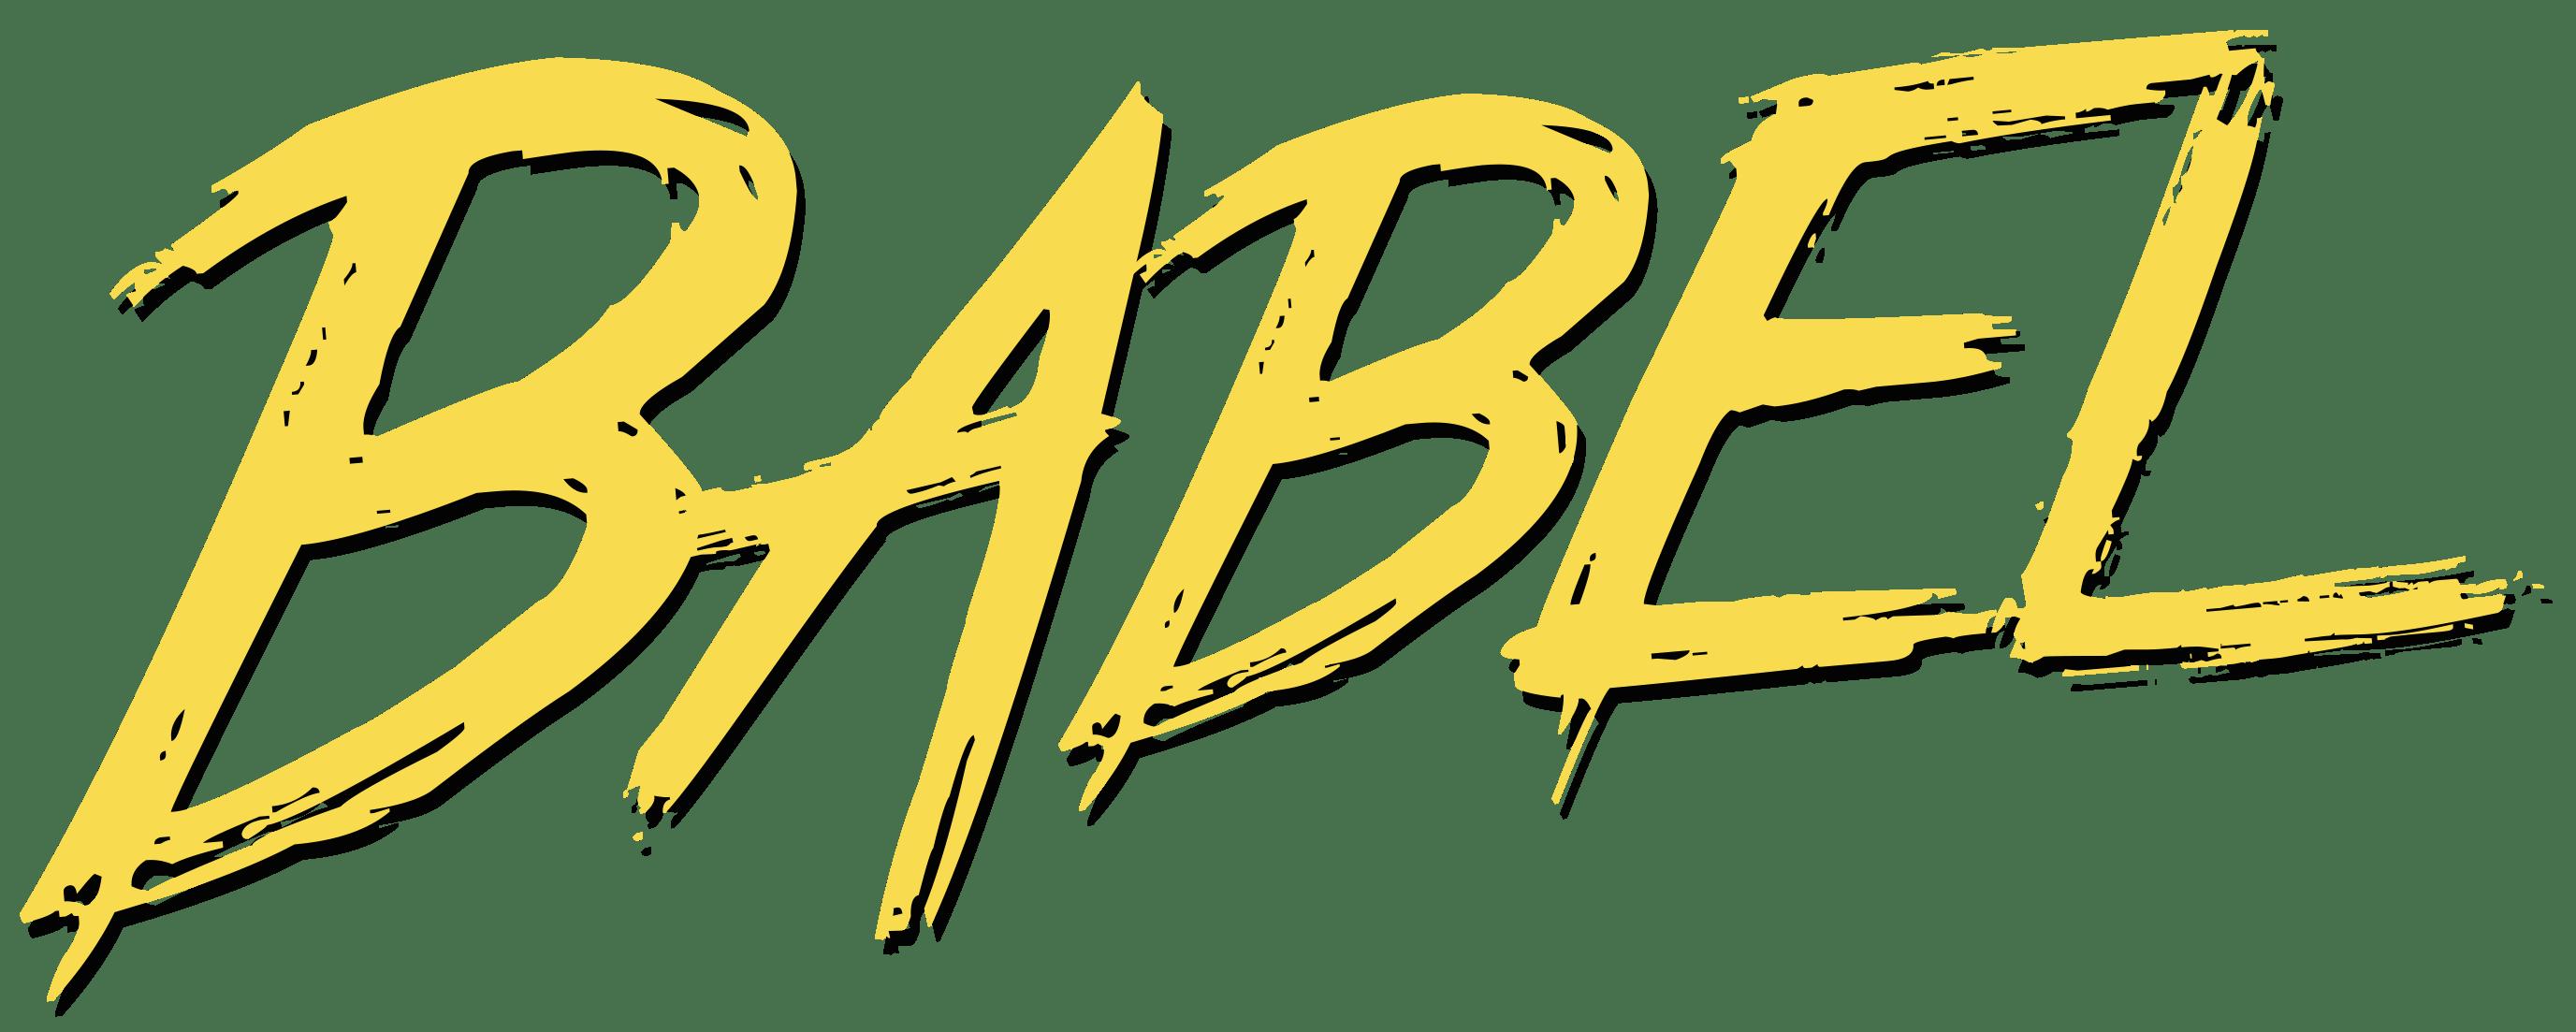 Babel-Javascript-compiler.png